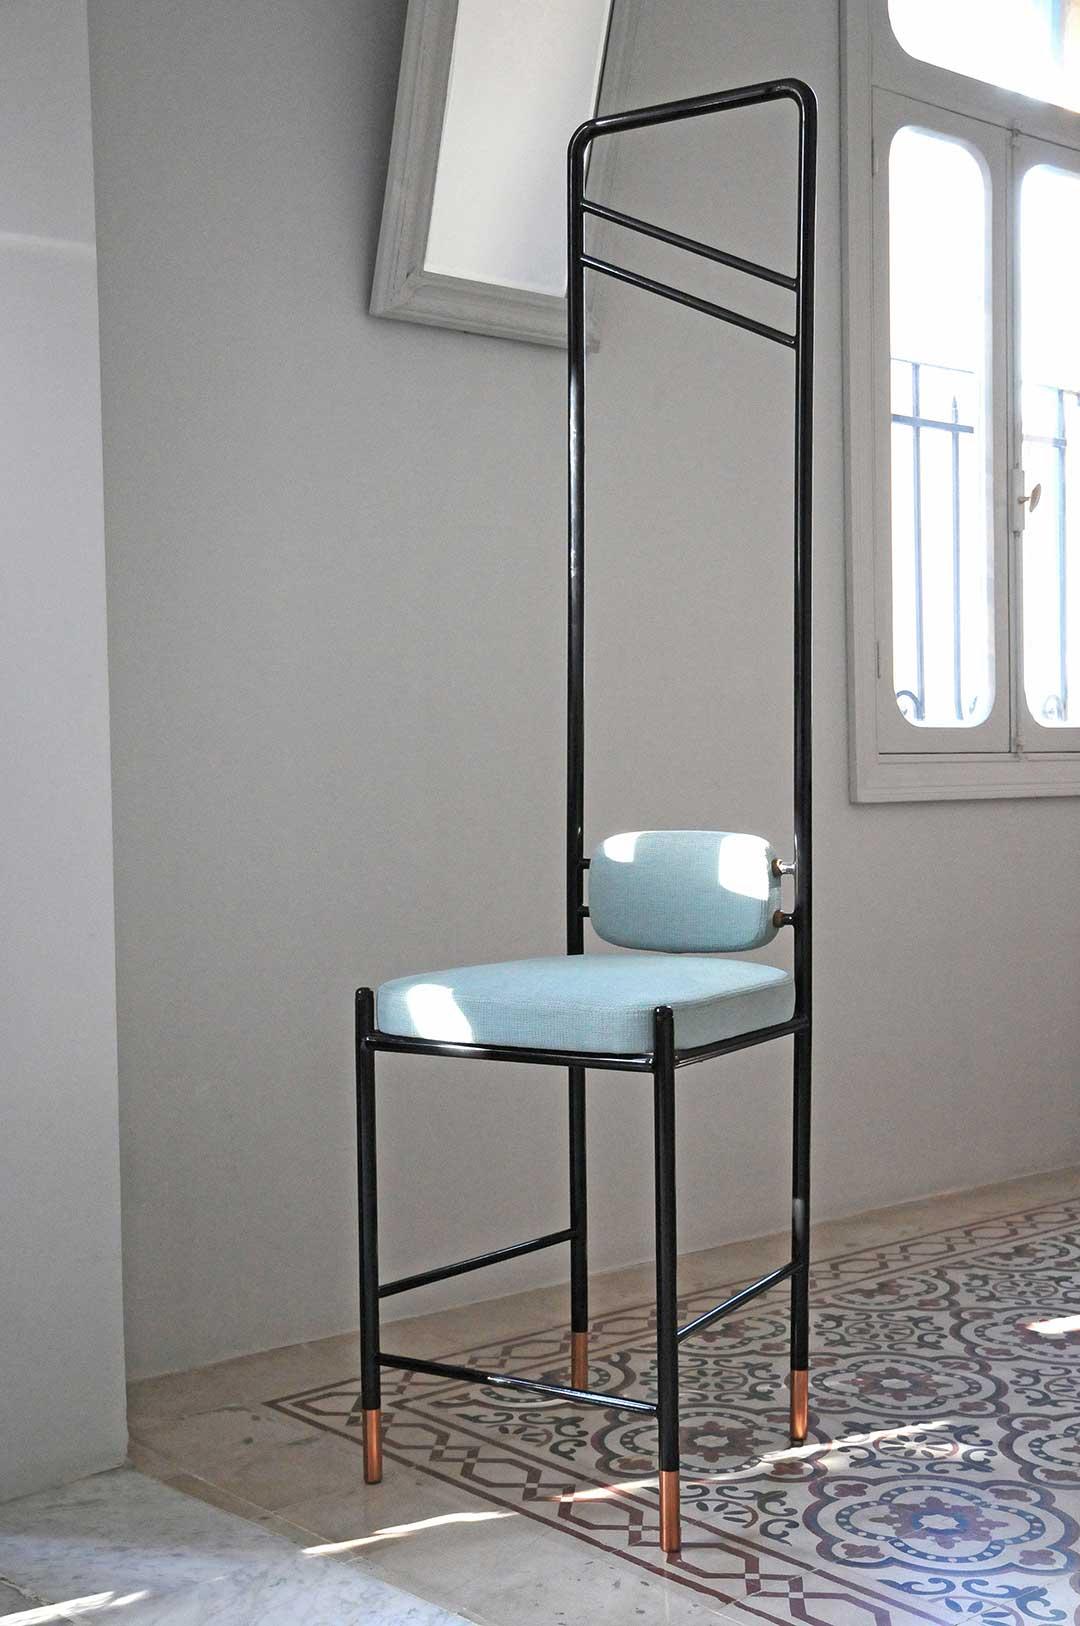 'Guillotine' High Chair by david/nicolas | Yellowtrace